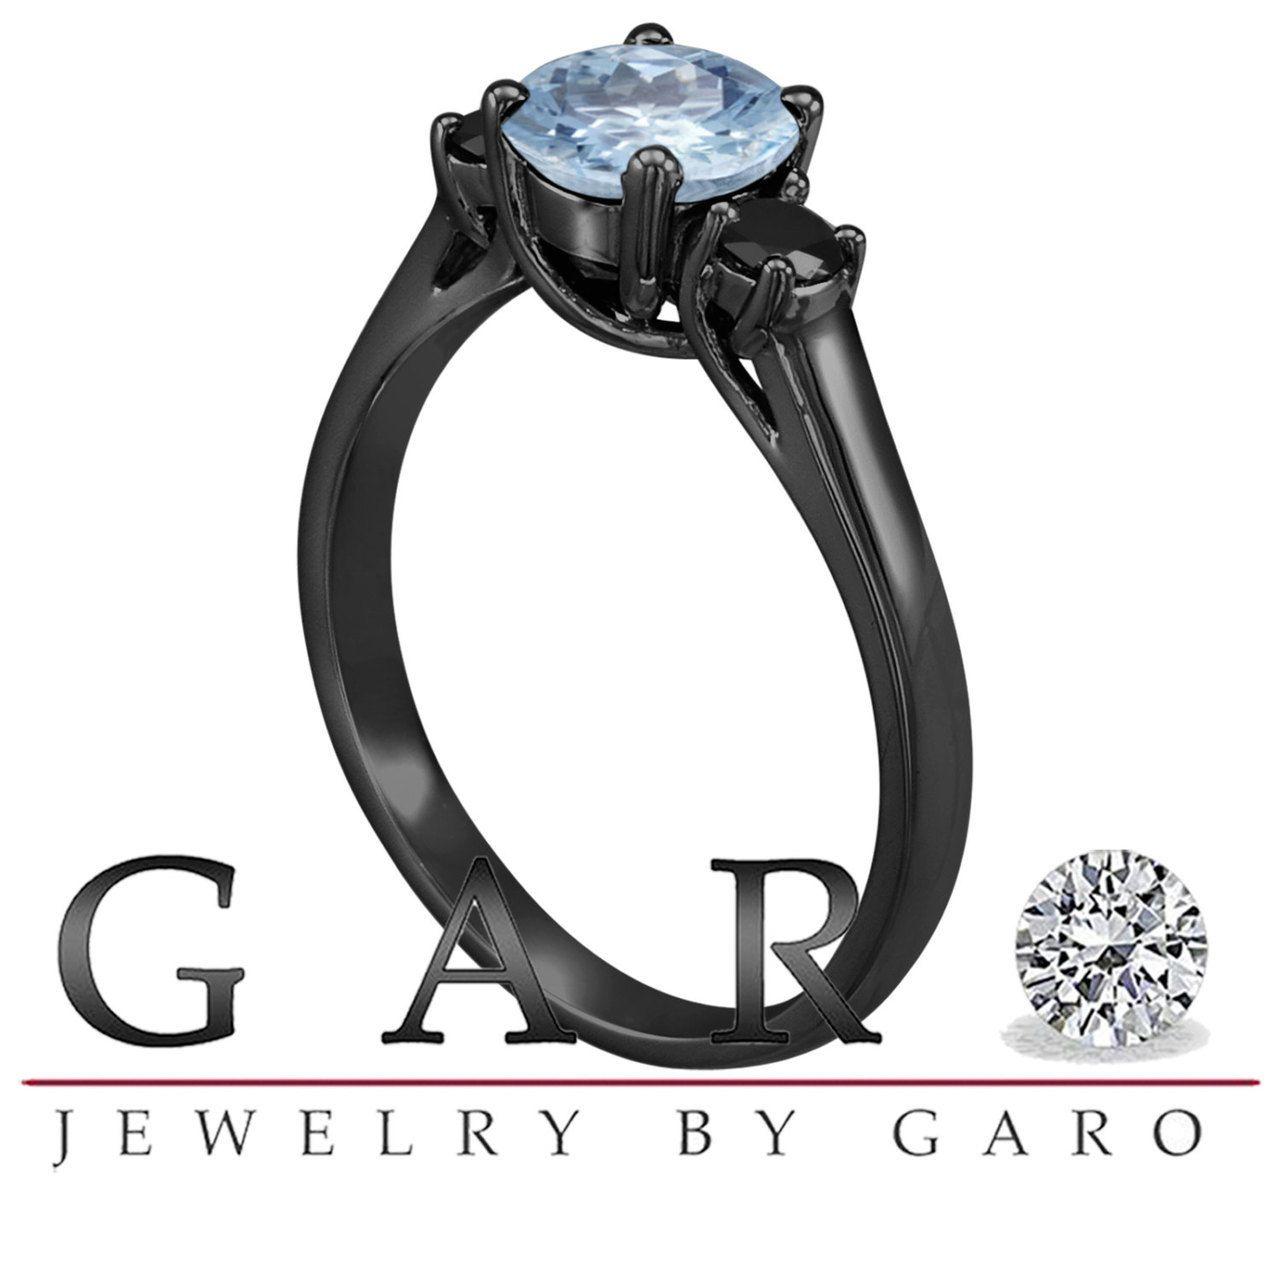 Aquamarine And Black Diamonds Three Stone Engagement Ring Vintage Style 14K Black Gold 1.16 Carat Birthstone